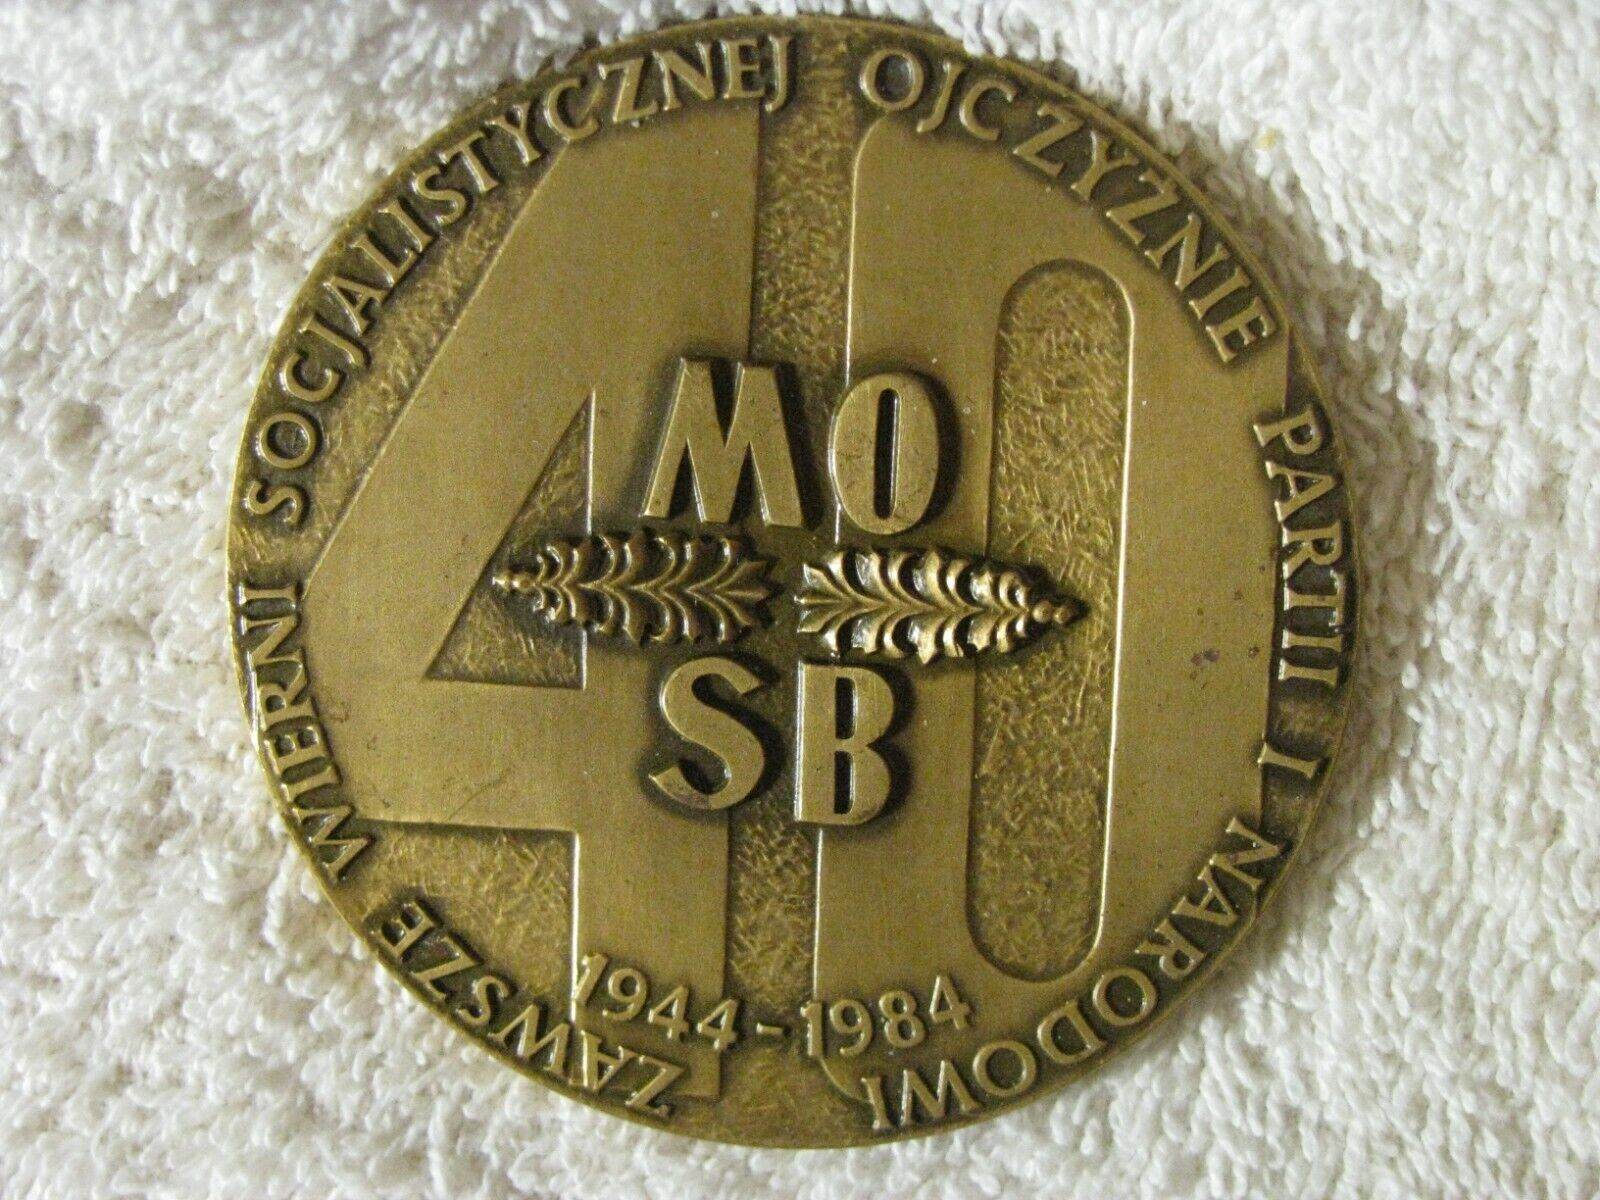 POLAND MEDAL. SOCIALISM. MOSB. - $6.00